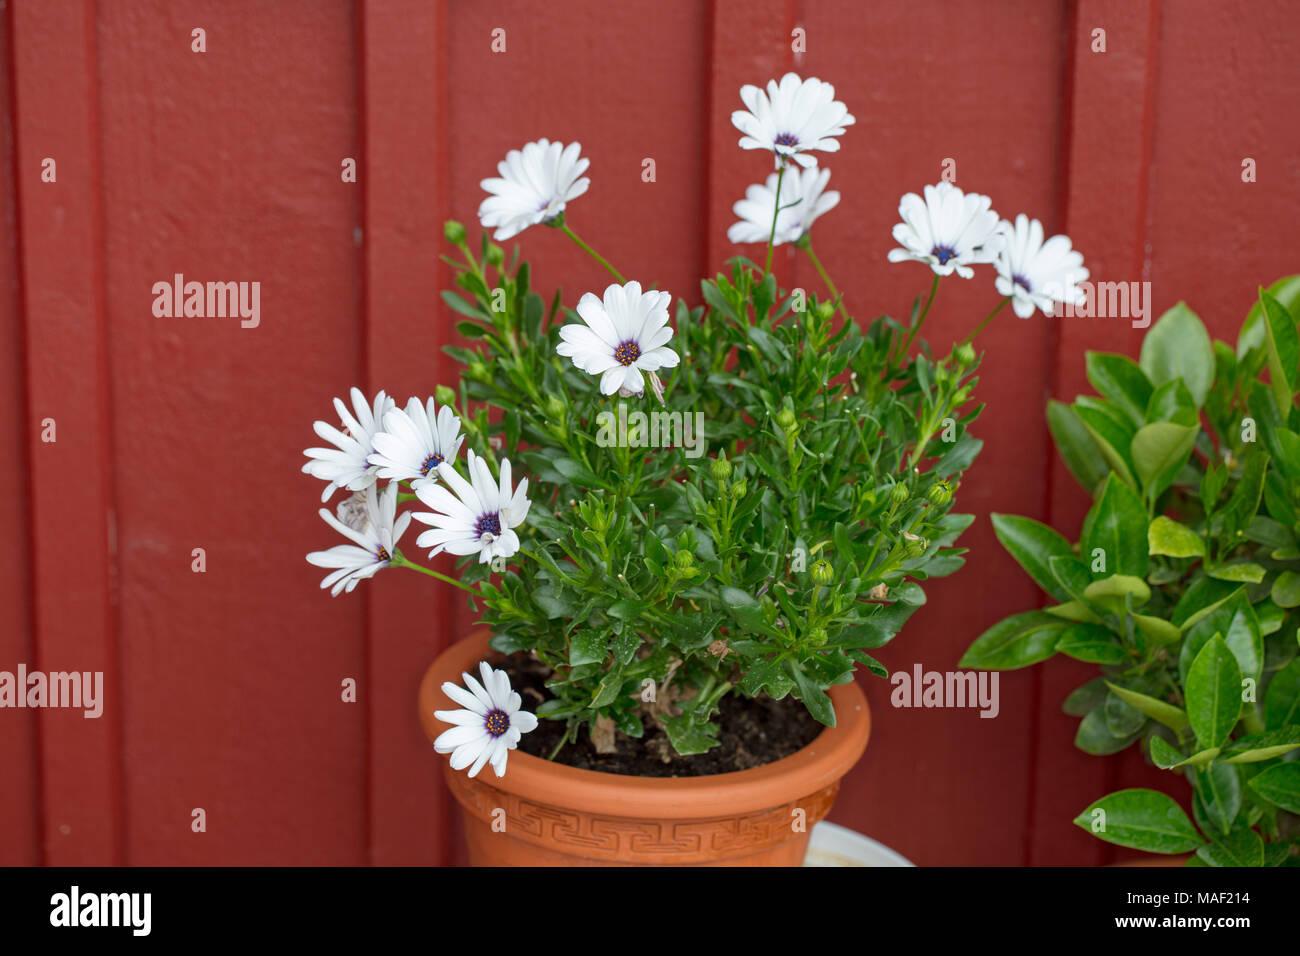 'Vit' Daisybush, Stjärnöga (Osteospermum) - Stock Image